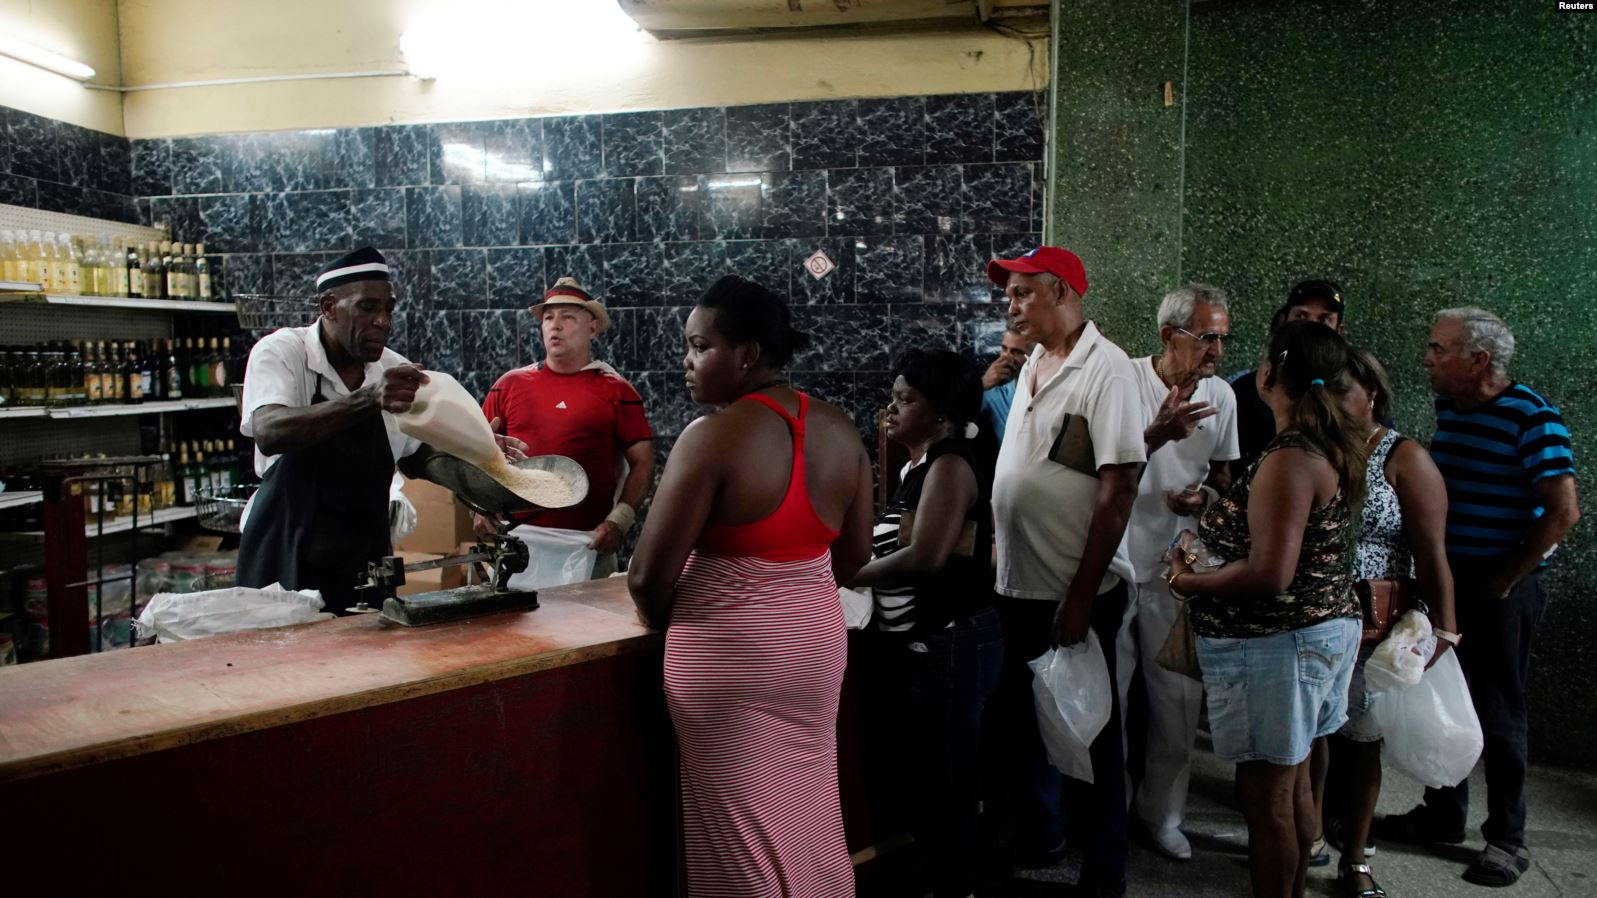 Una bodega en La Habana.